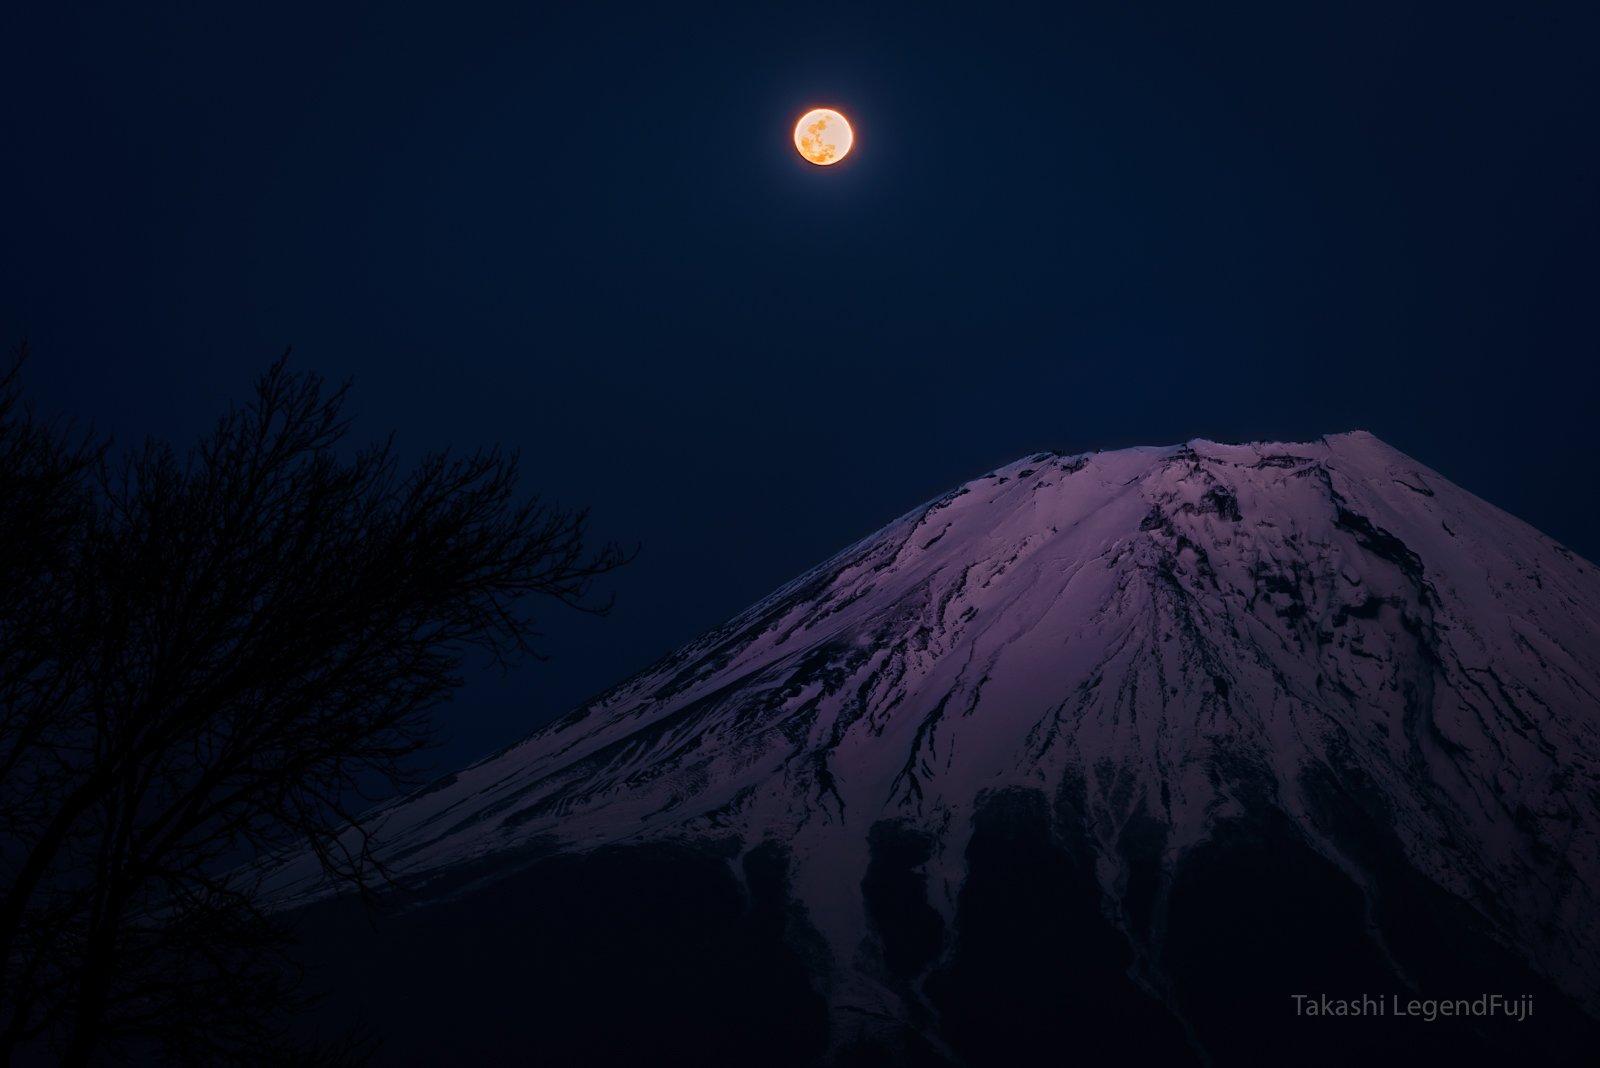 fuji,mountain,night,luna,moon,snow,purple,tree,, Takashi